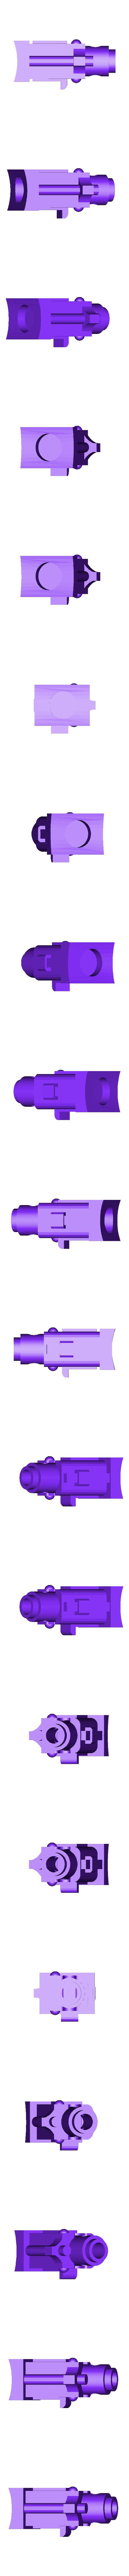 Gun_HeavyBolter_Right.stl Download free STL file Catoblepas SPG • 3D printable design, nfeyma